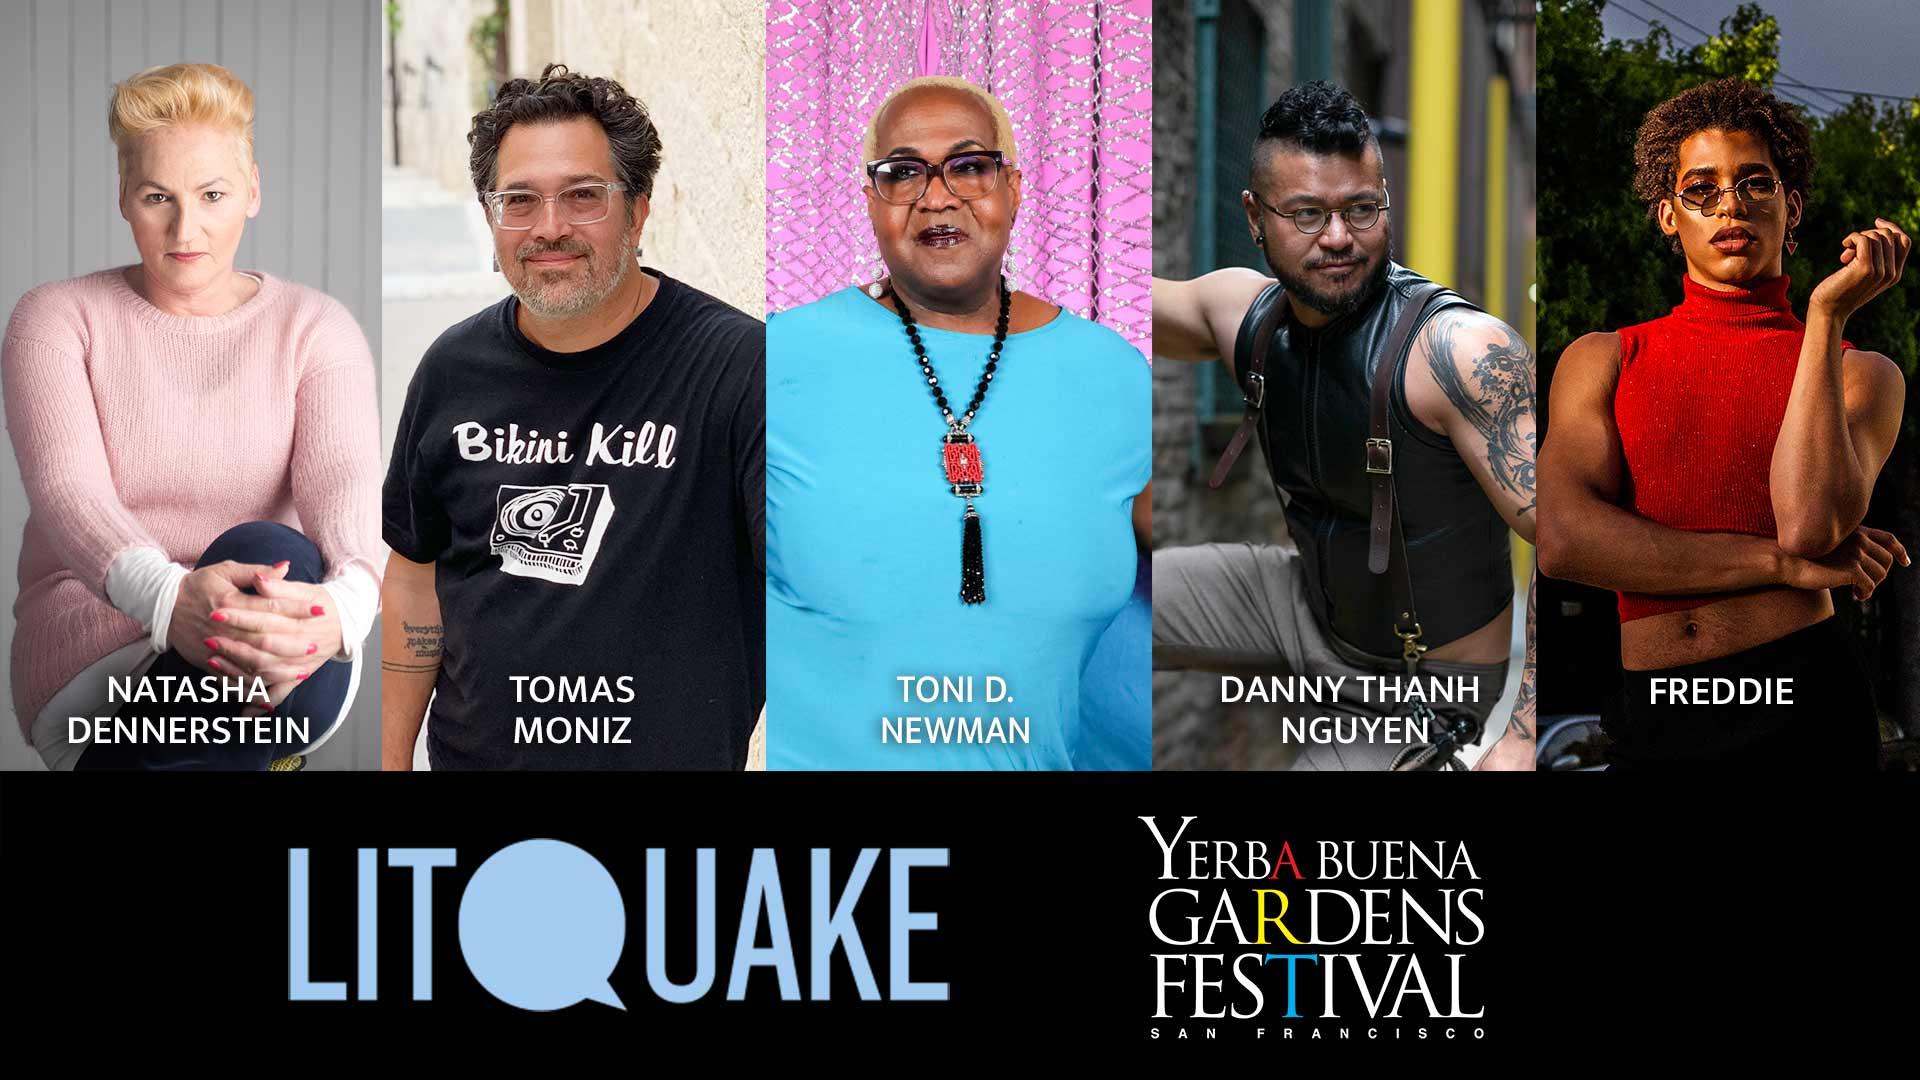 Photos of Natasha Dennerstein, Tomas Moniz, Toni D. Newman, Danny Thanh Nguyen, and Freddie. Presented by Yerba Buena Gardens Festival and Litquake.